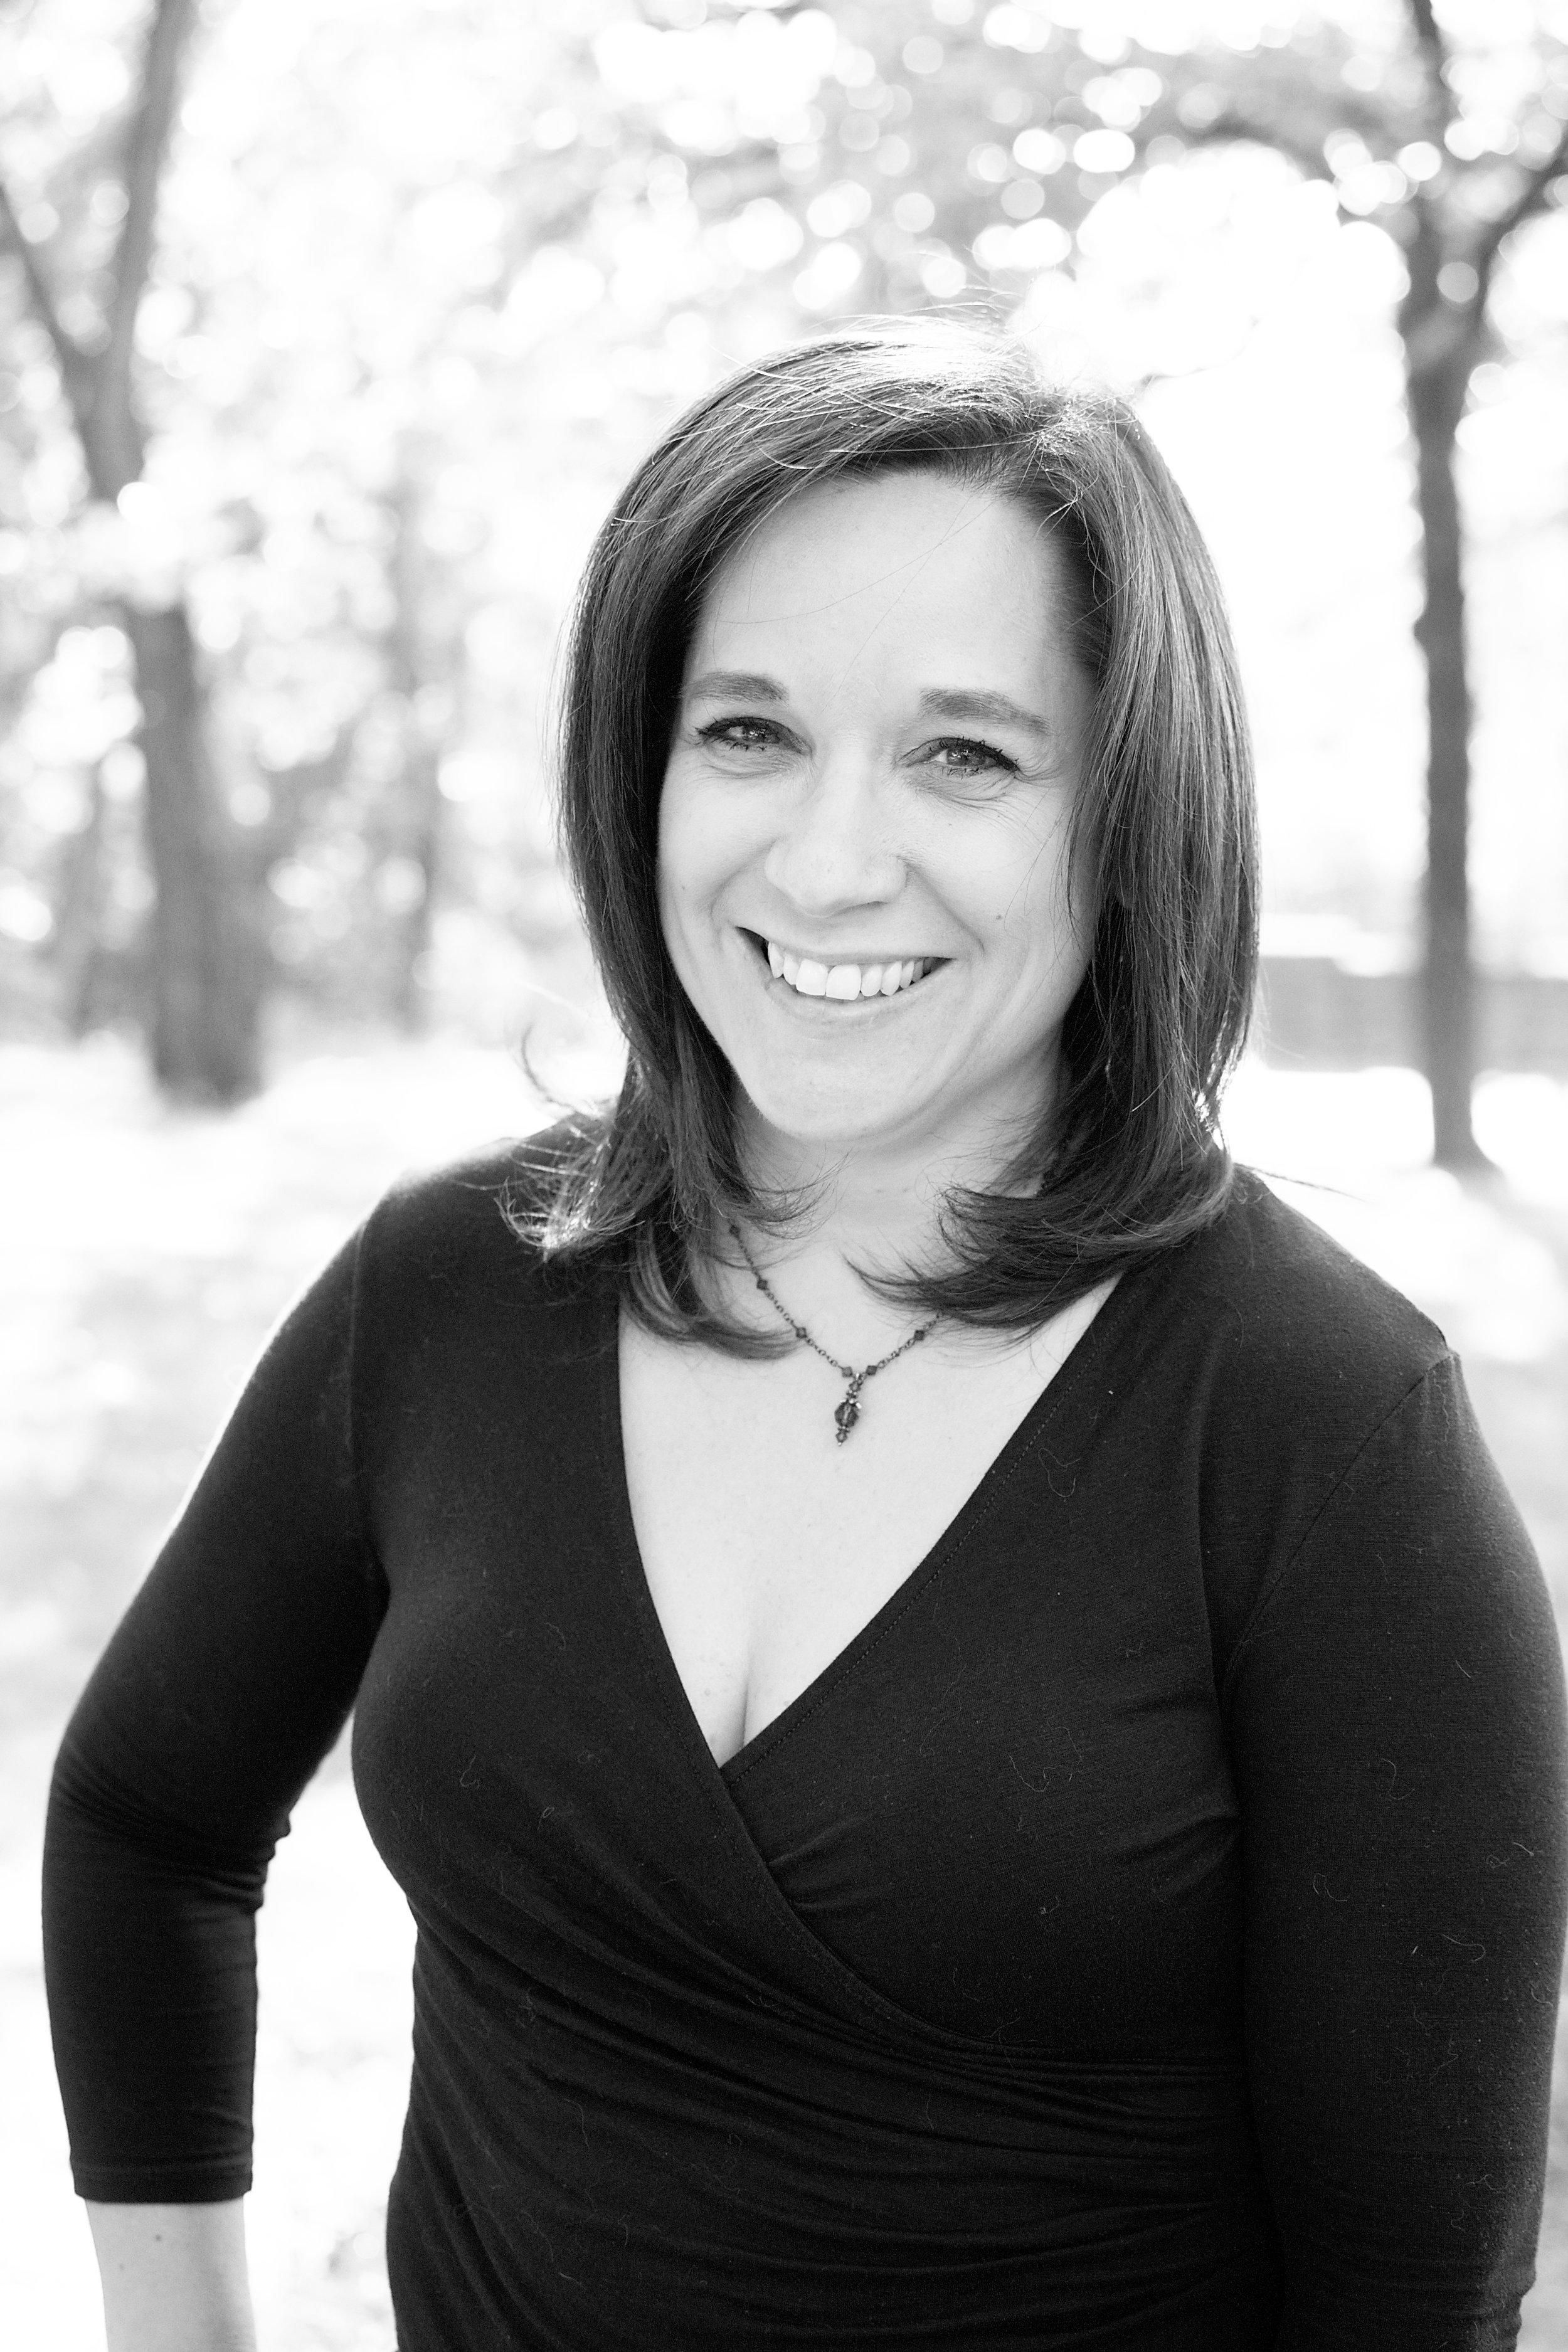 KathyMarcelle, SugarPearDesign